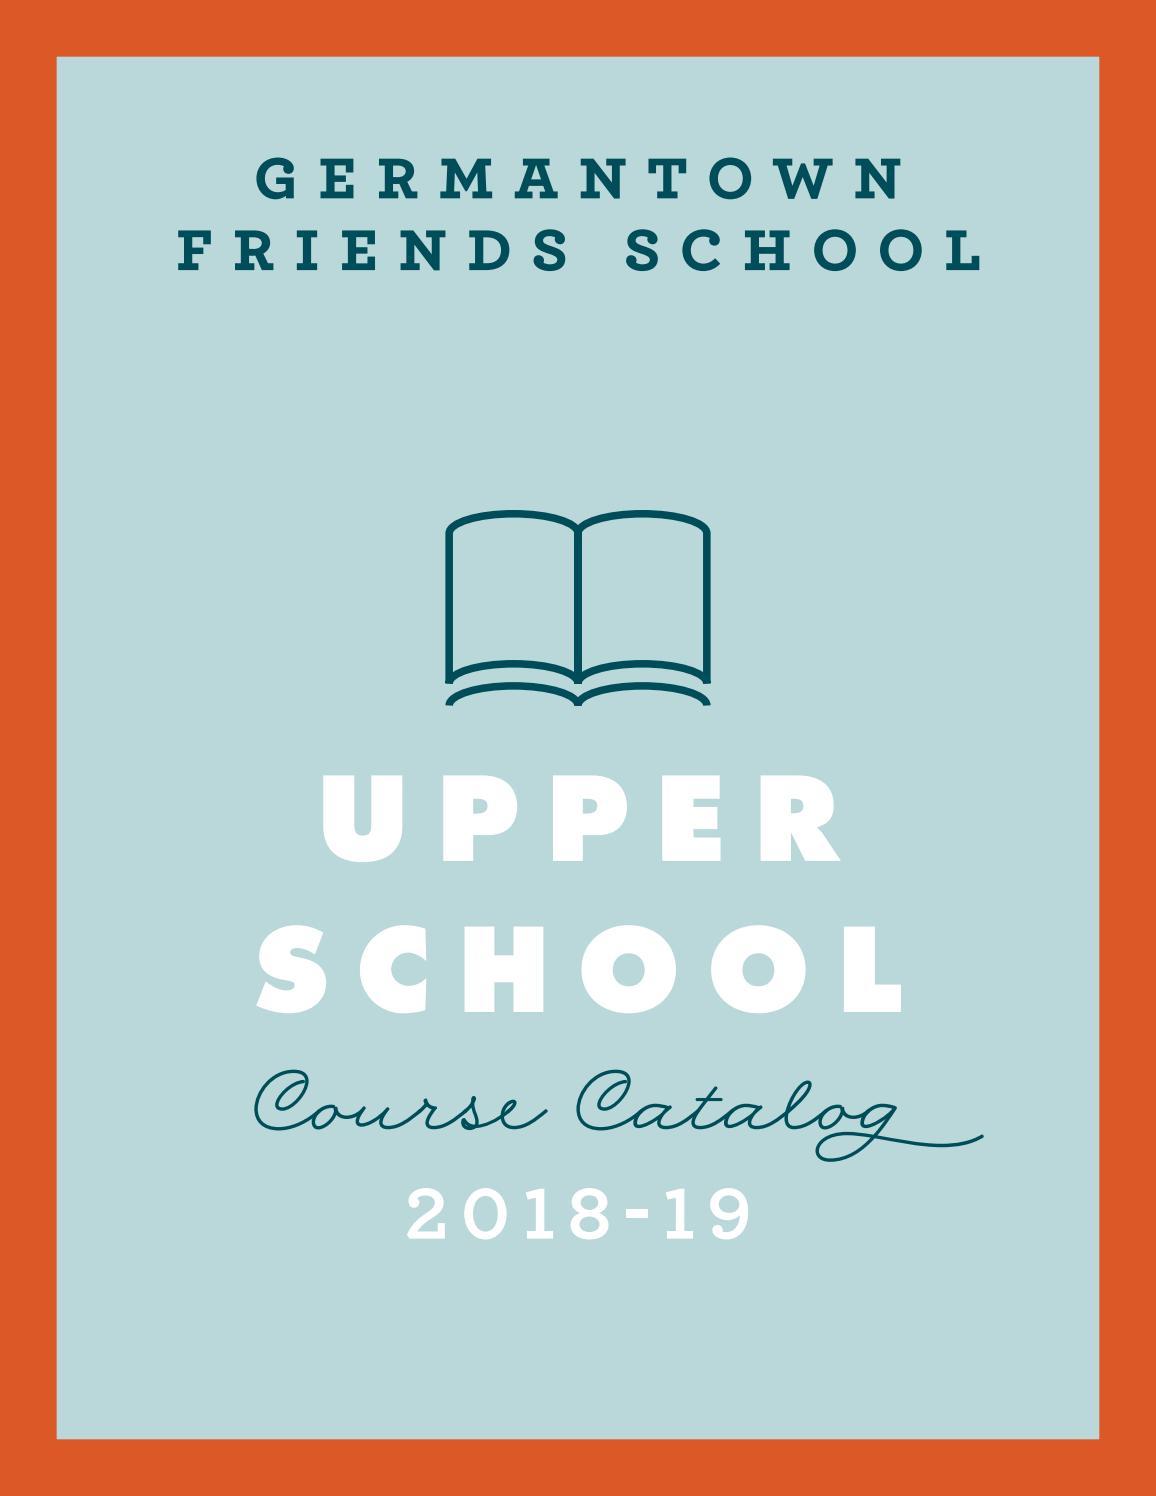 GFS Upper School Course Catalog 2018-19 by Germantown Friends School ...